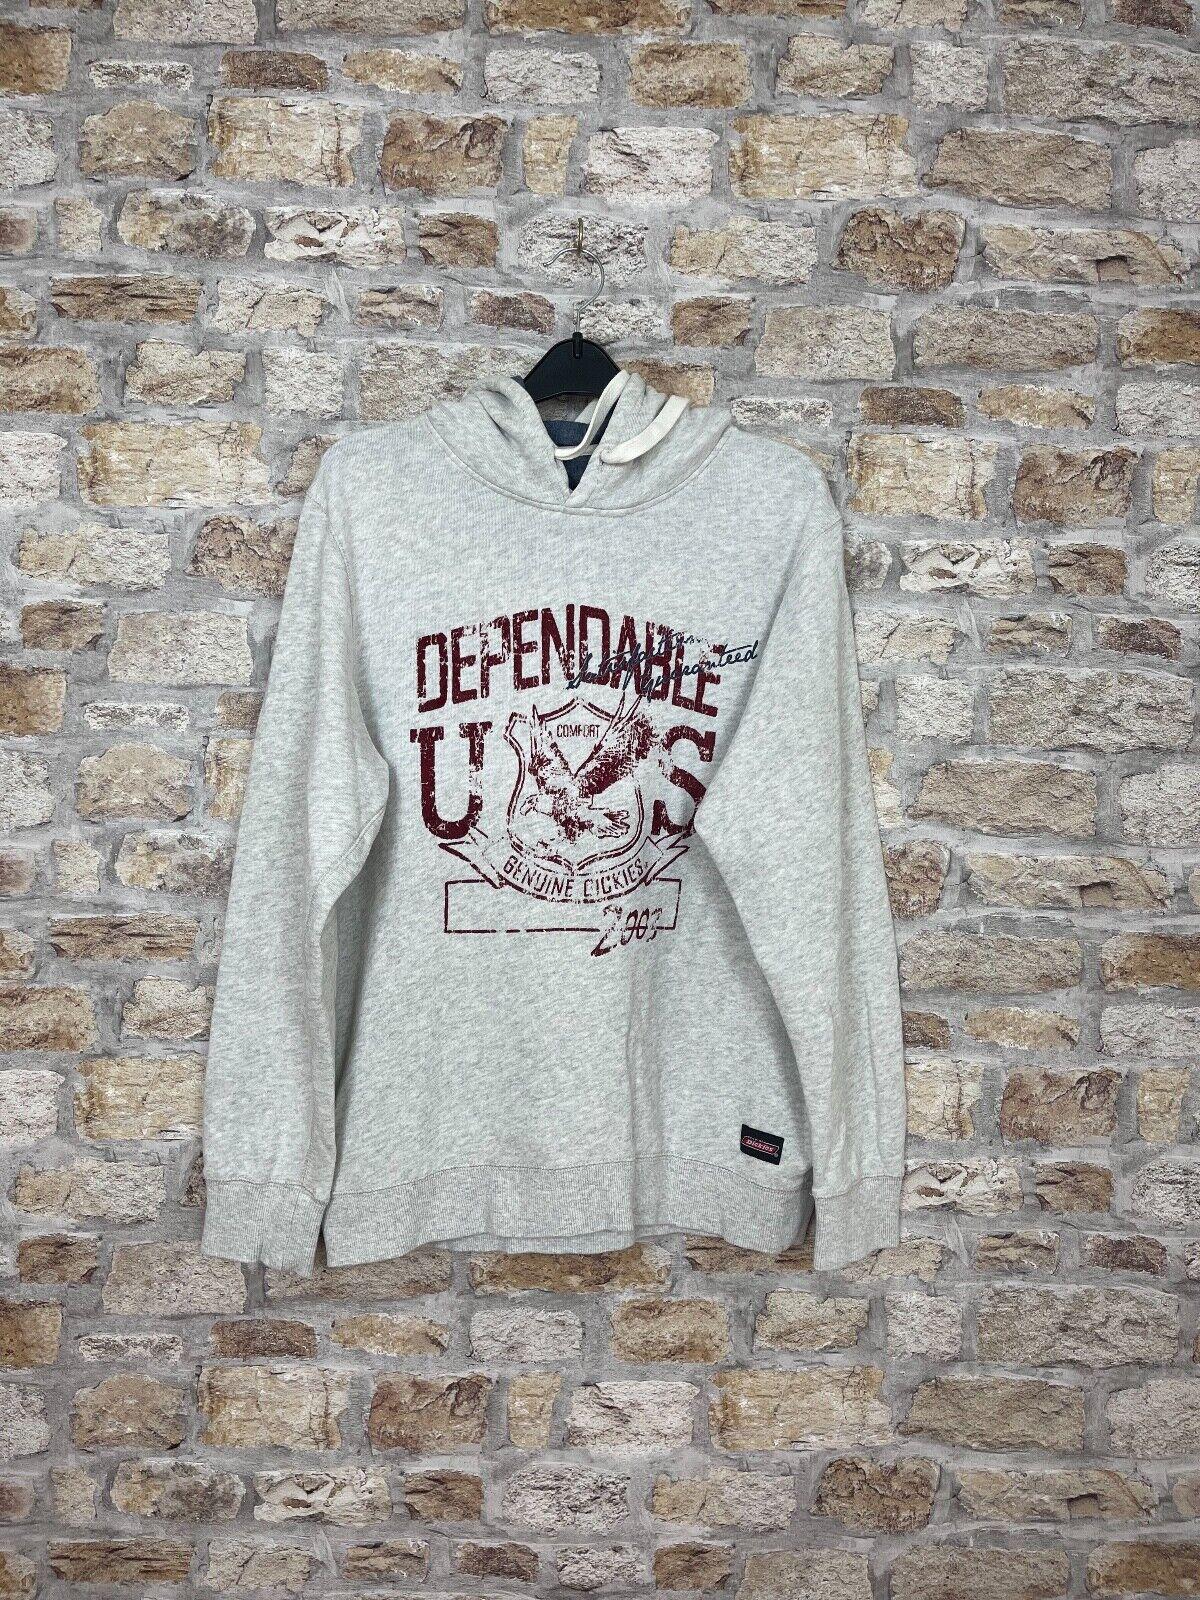 Vintage retro 90's USA Dickies grey sweatshirt hoodie men's size large logo #41